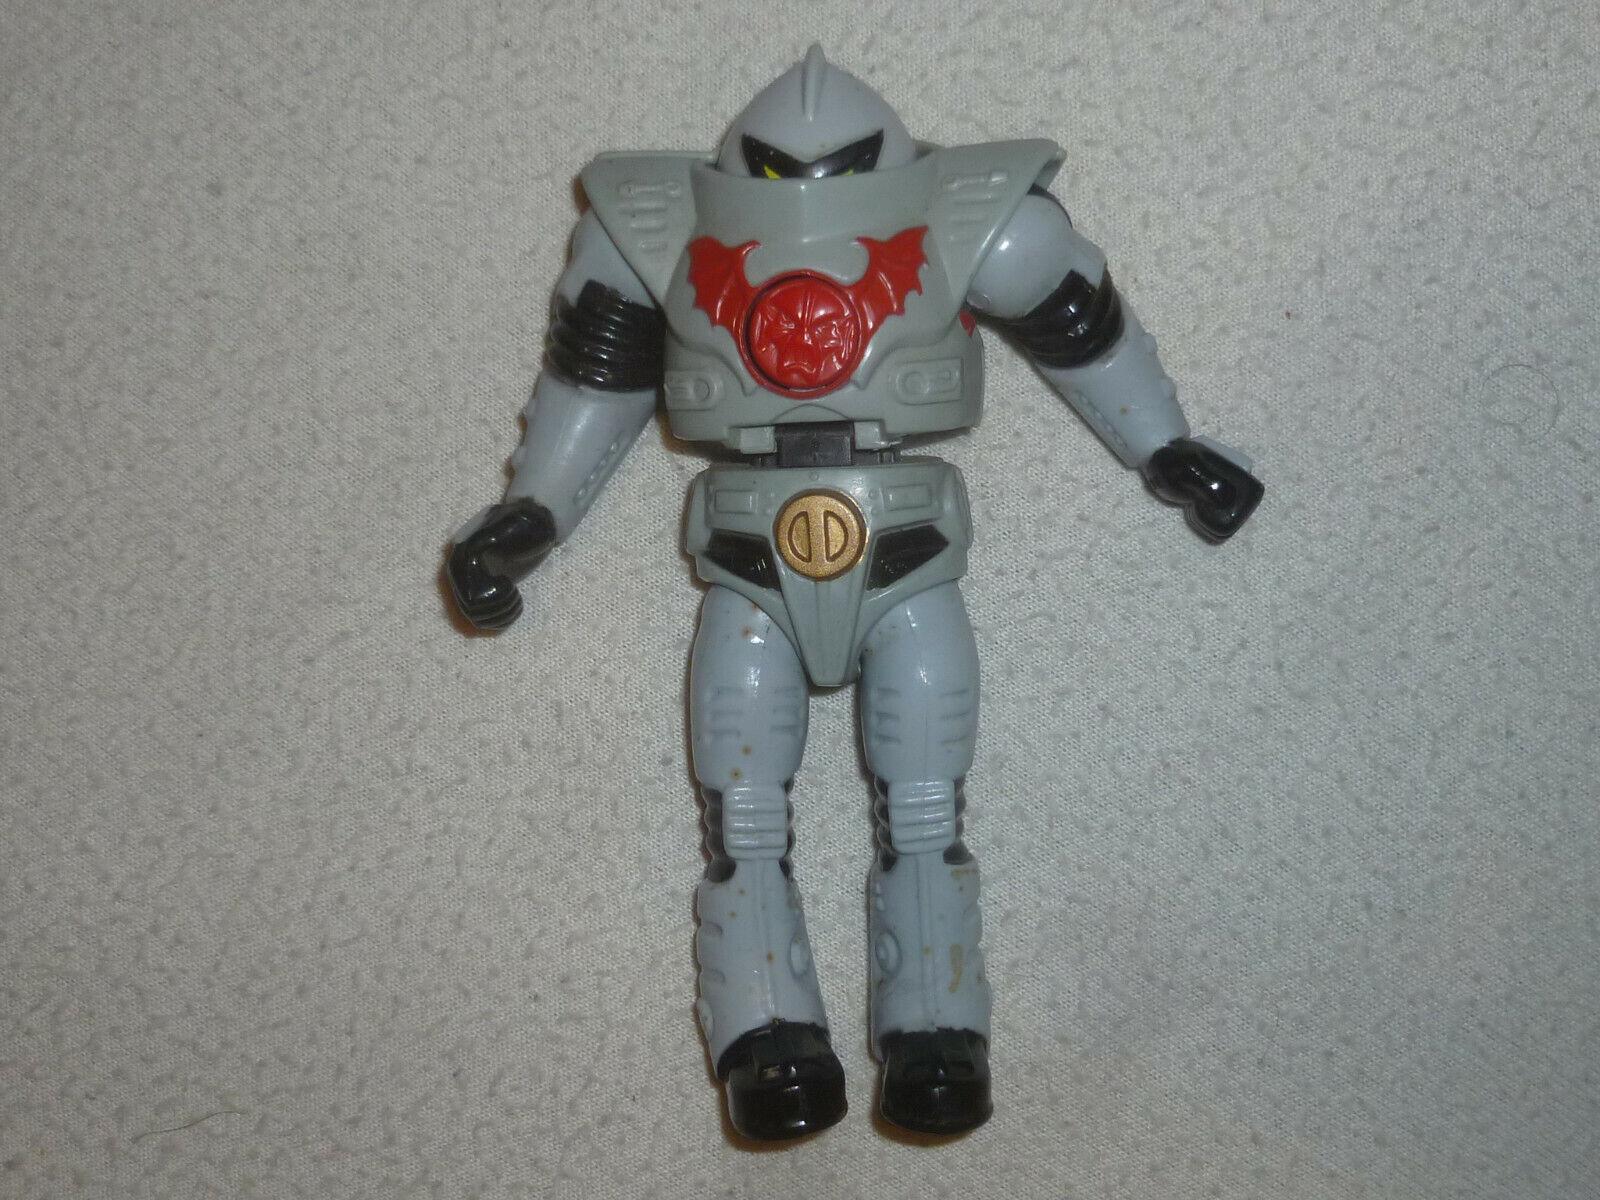 Vintage Figura Masters Of Universe Amos del universo horde trooper Heman 1986 MATTEL Raro